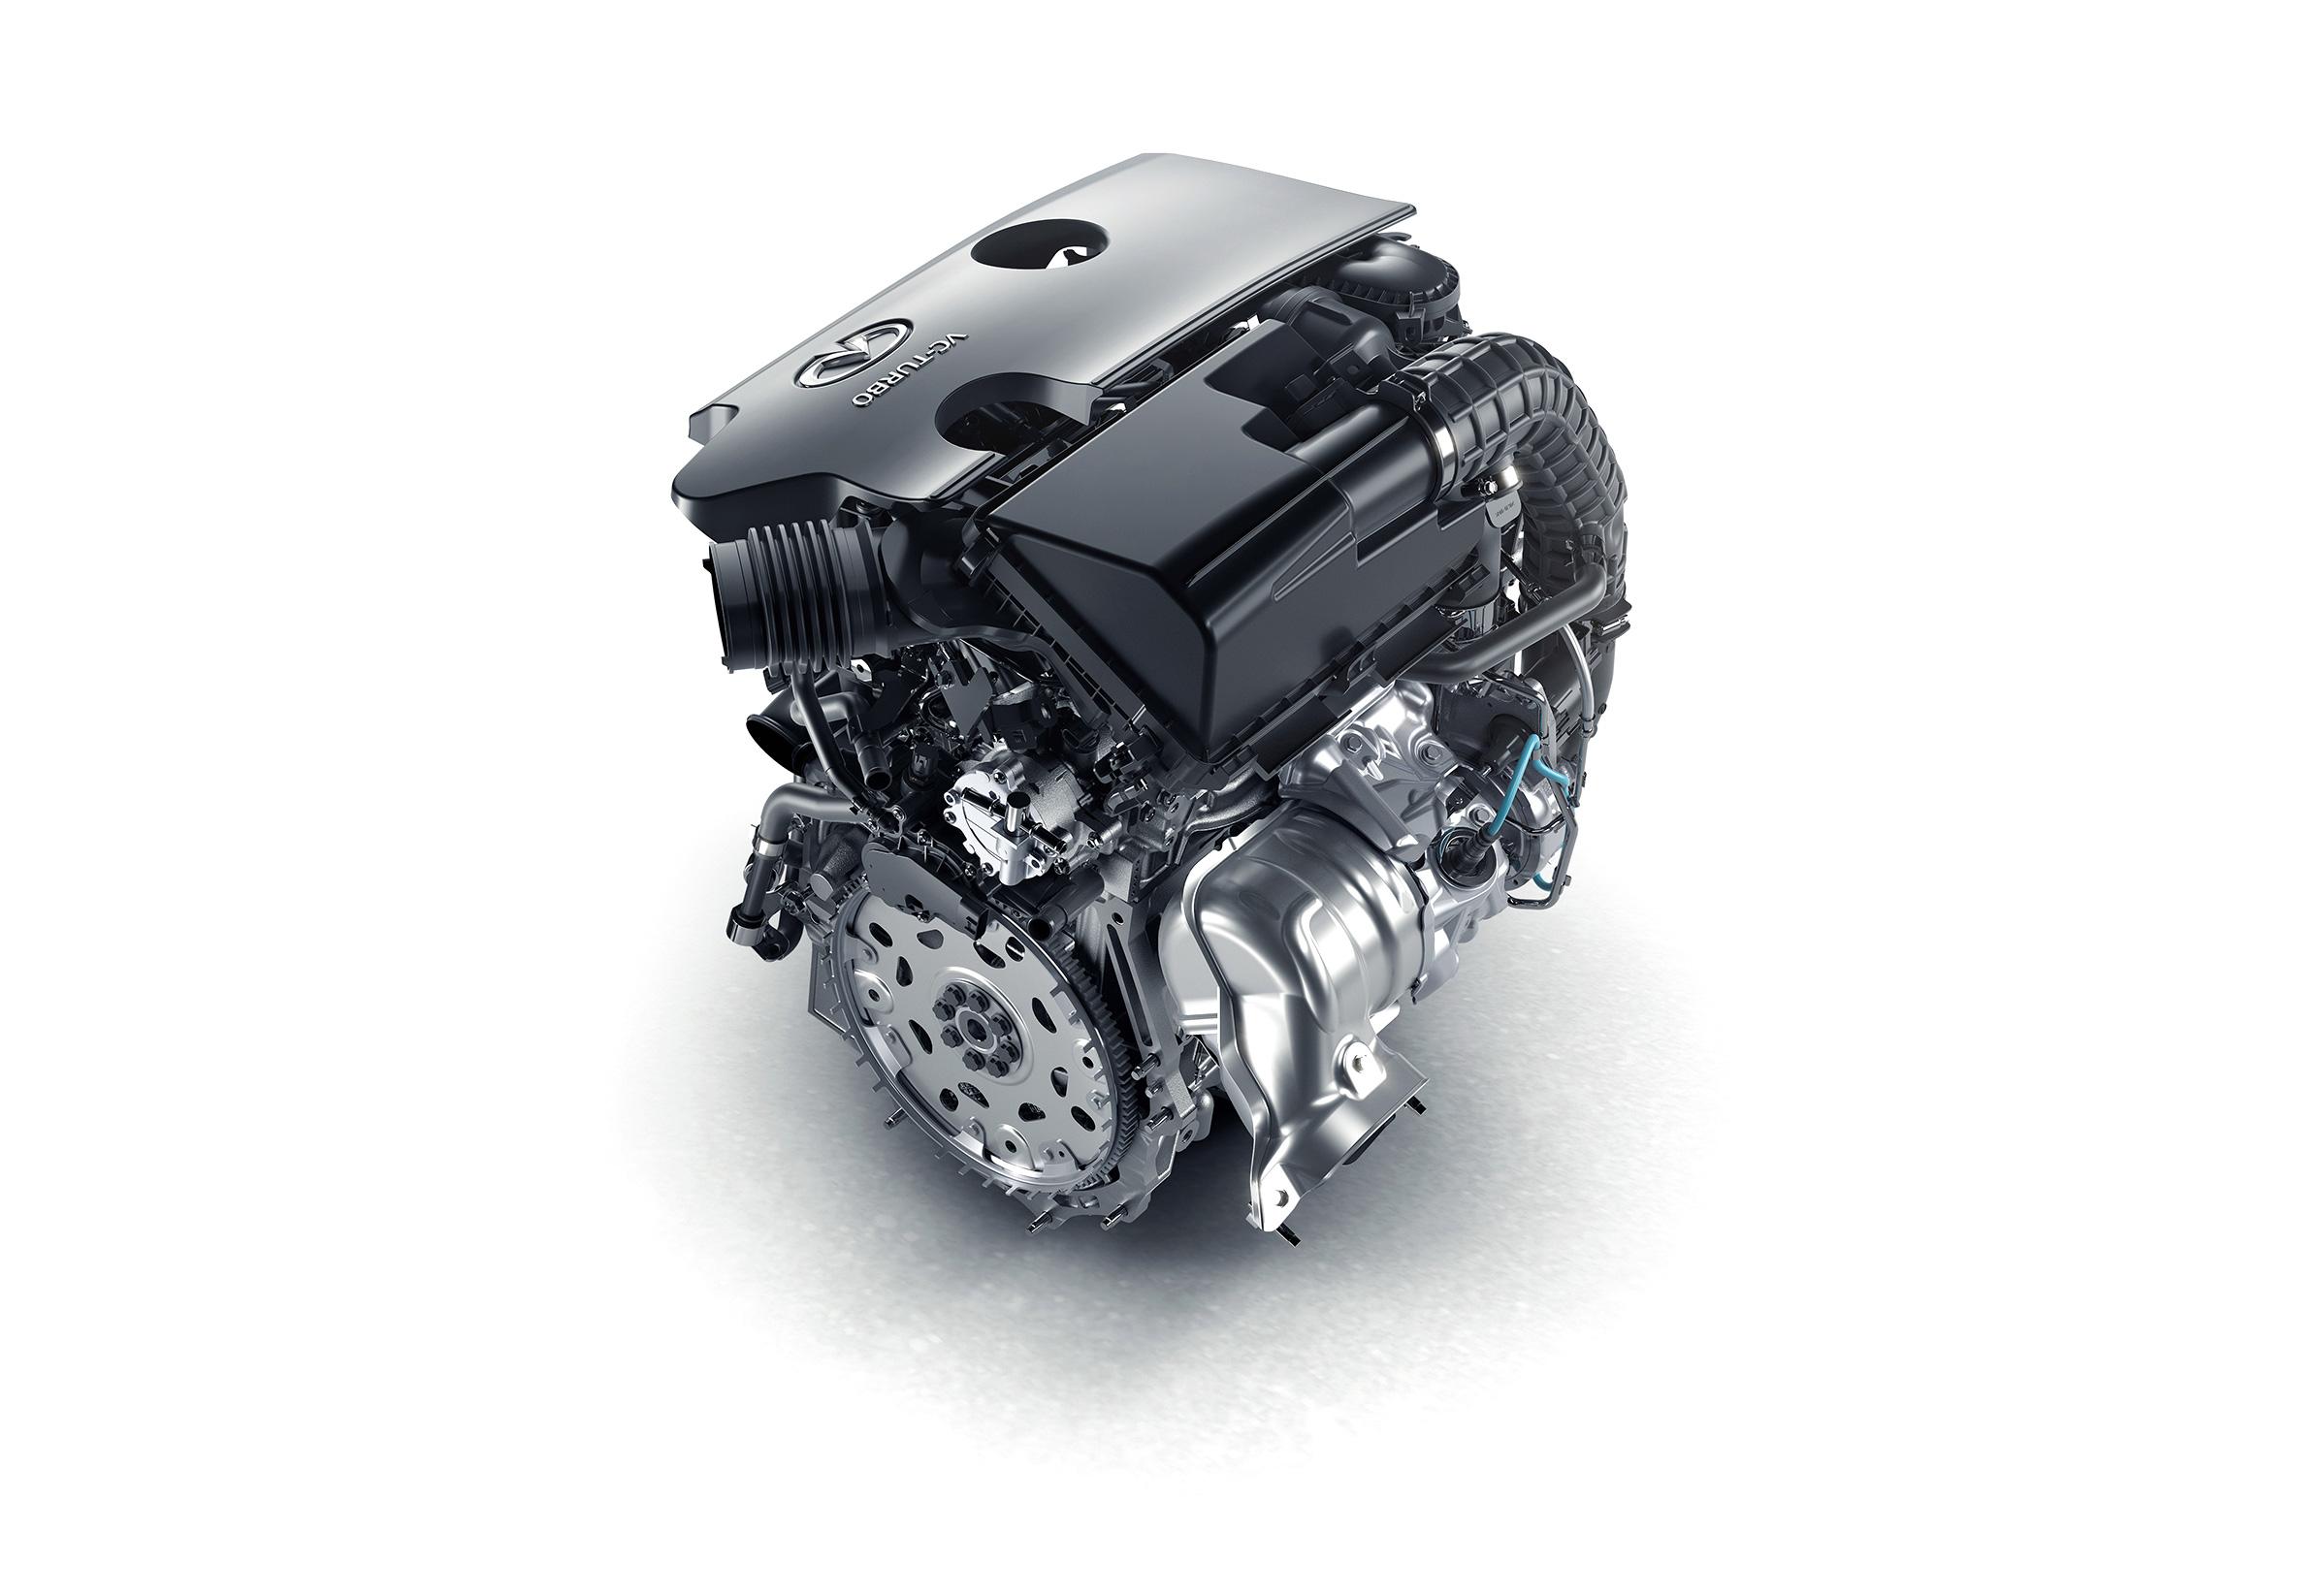 INFINITI-VC-T-engine---14-August-2016---R3-42k.jpg